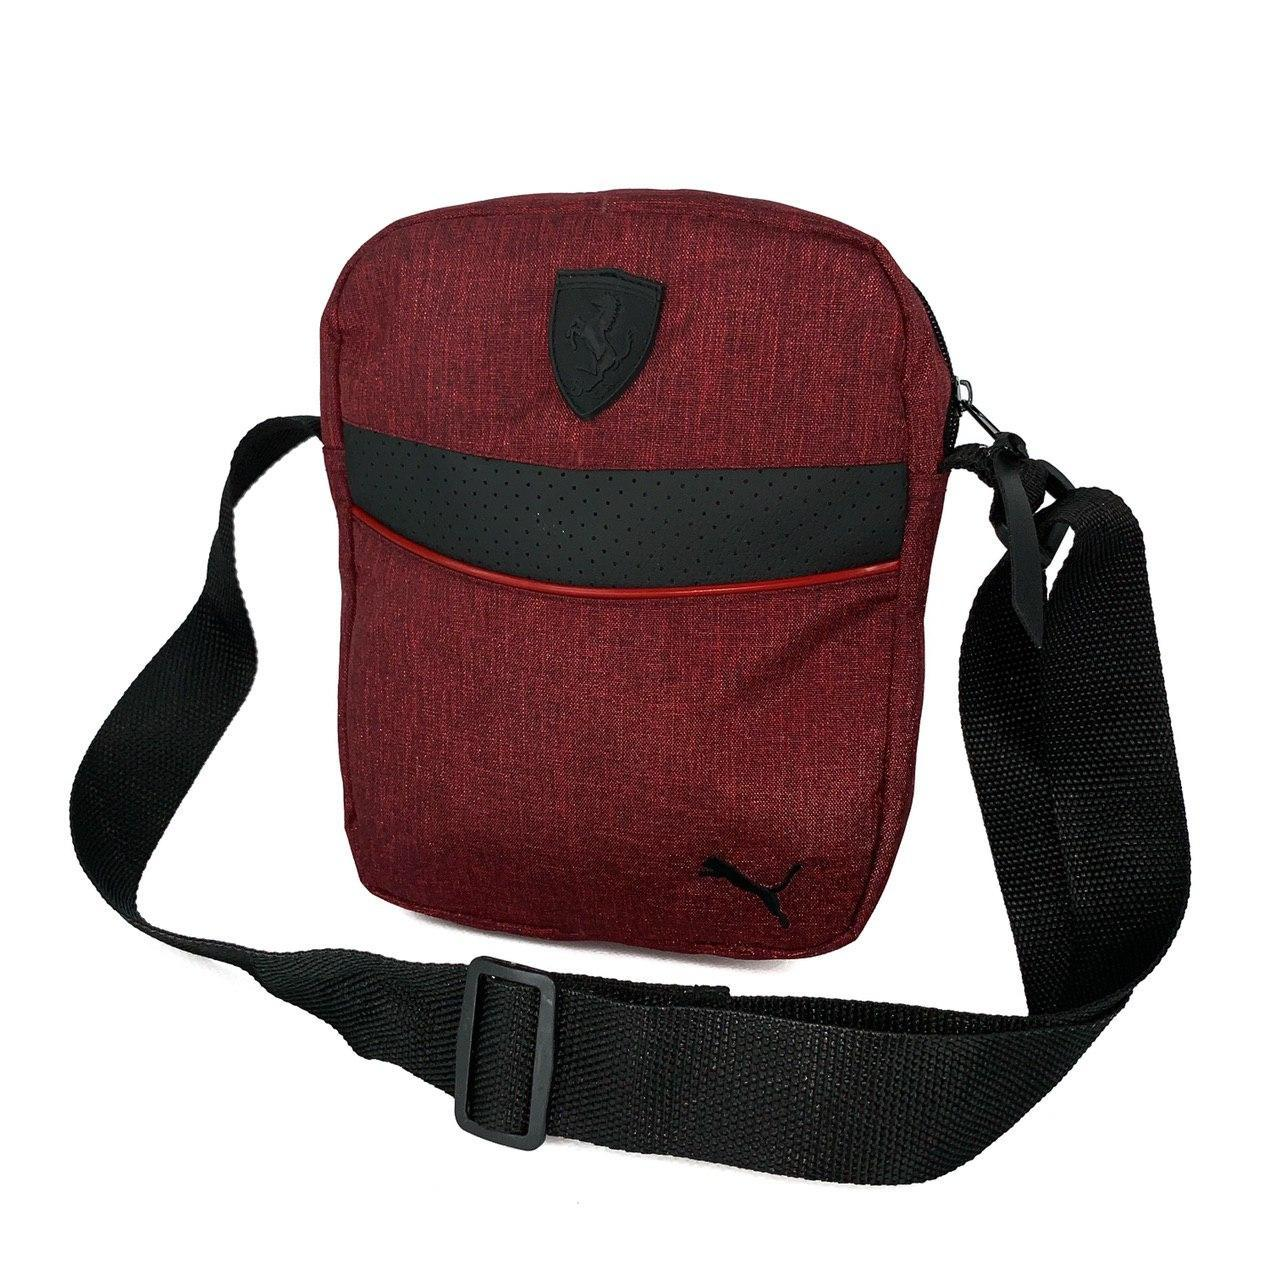 Мужская барсетка Puma Ferrari красная (Пума Ферари) сумка через плечо